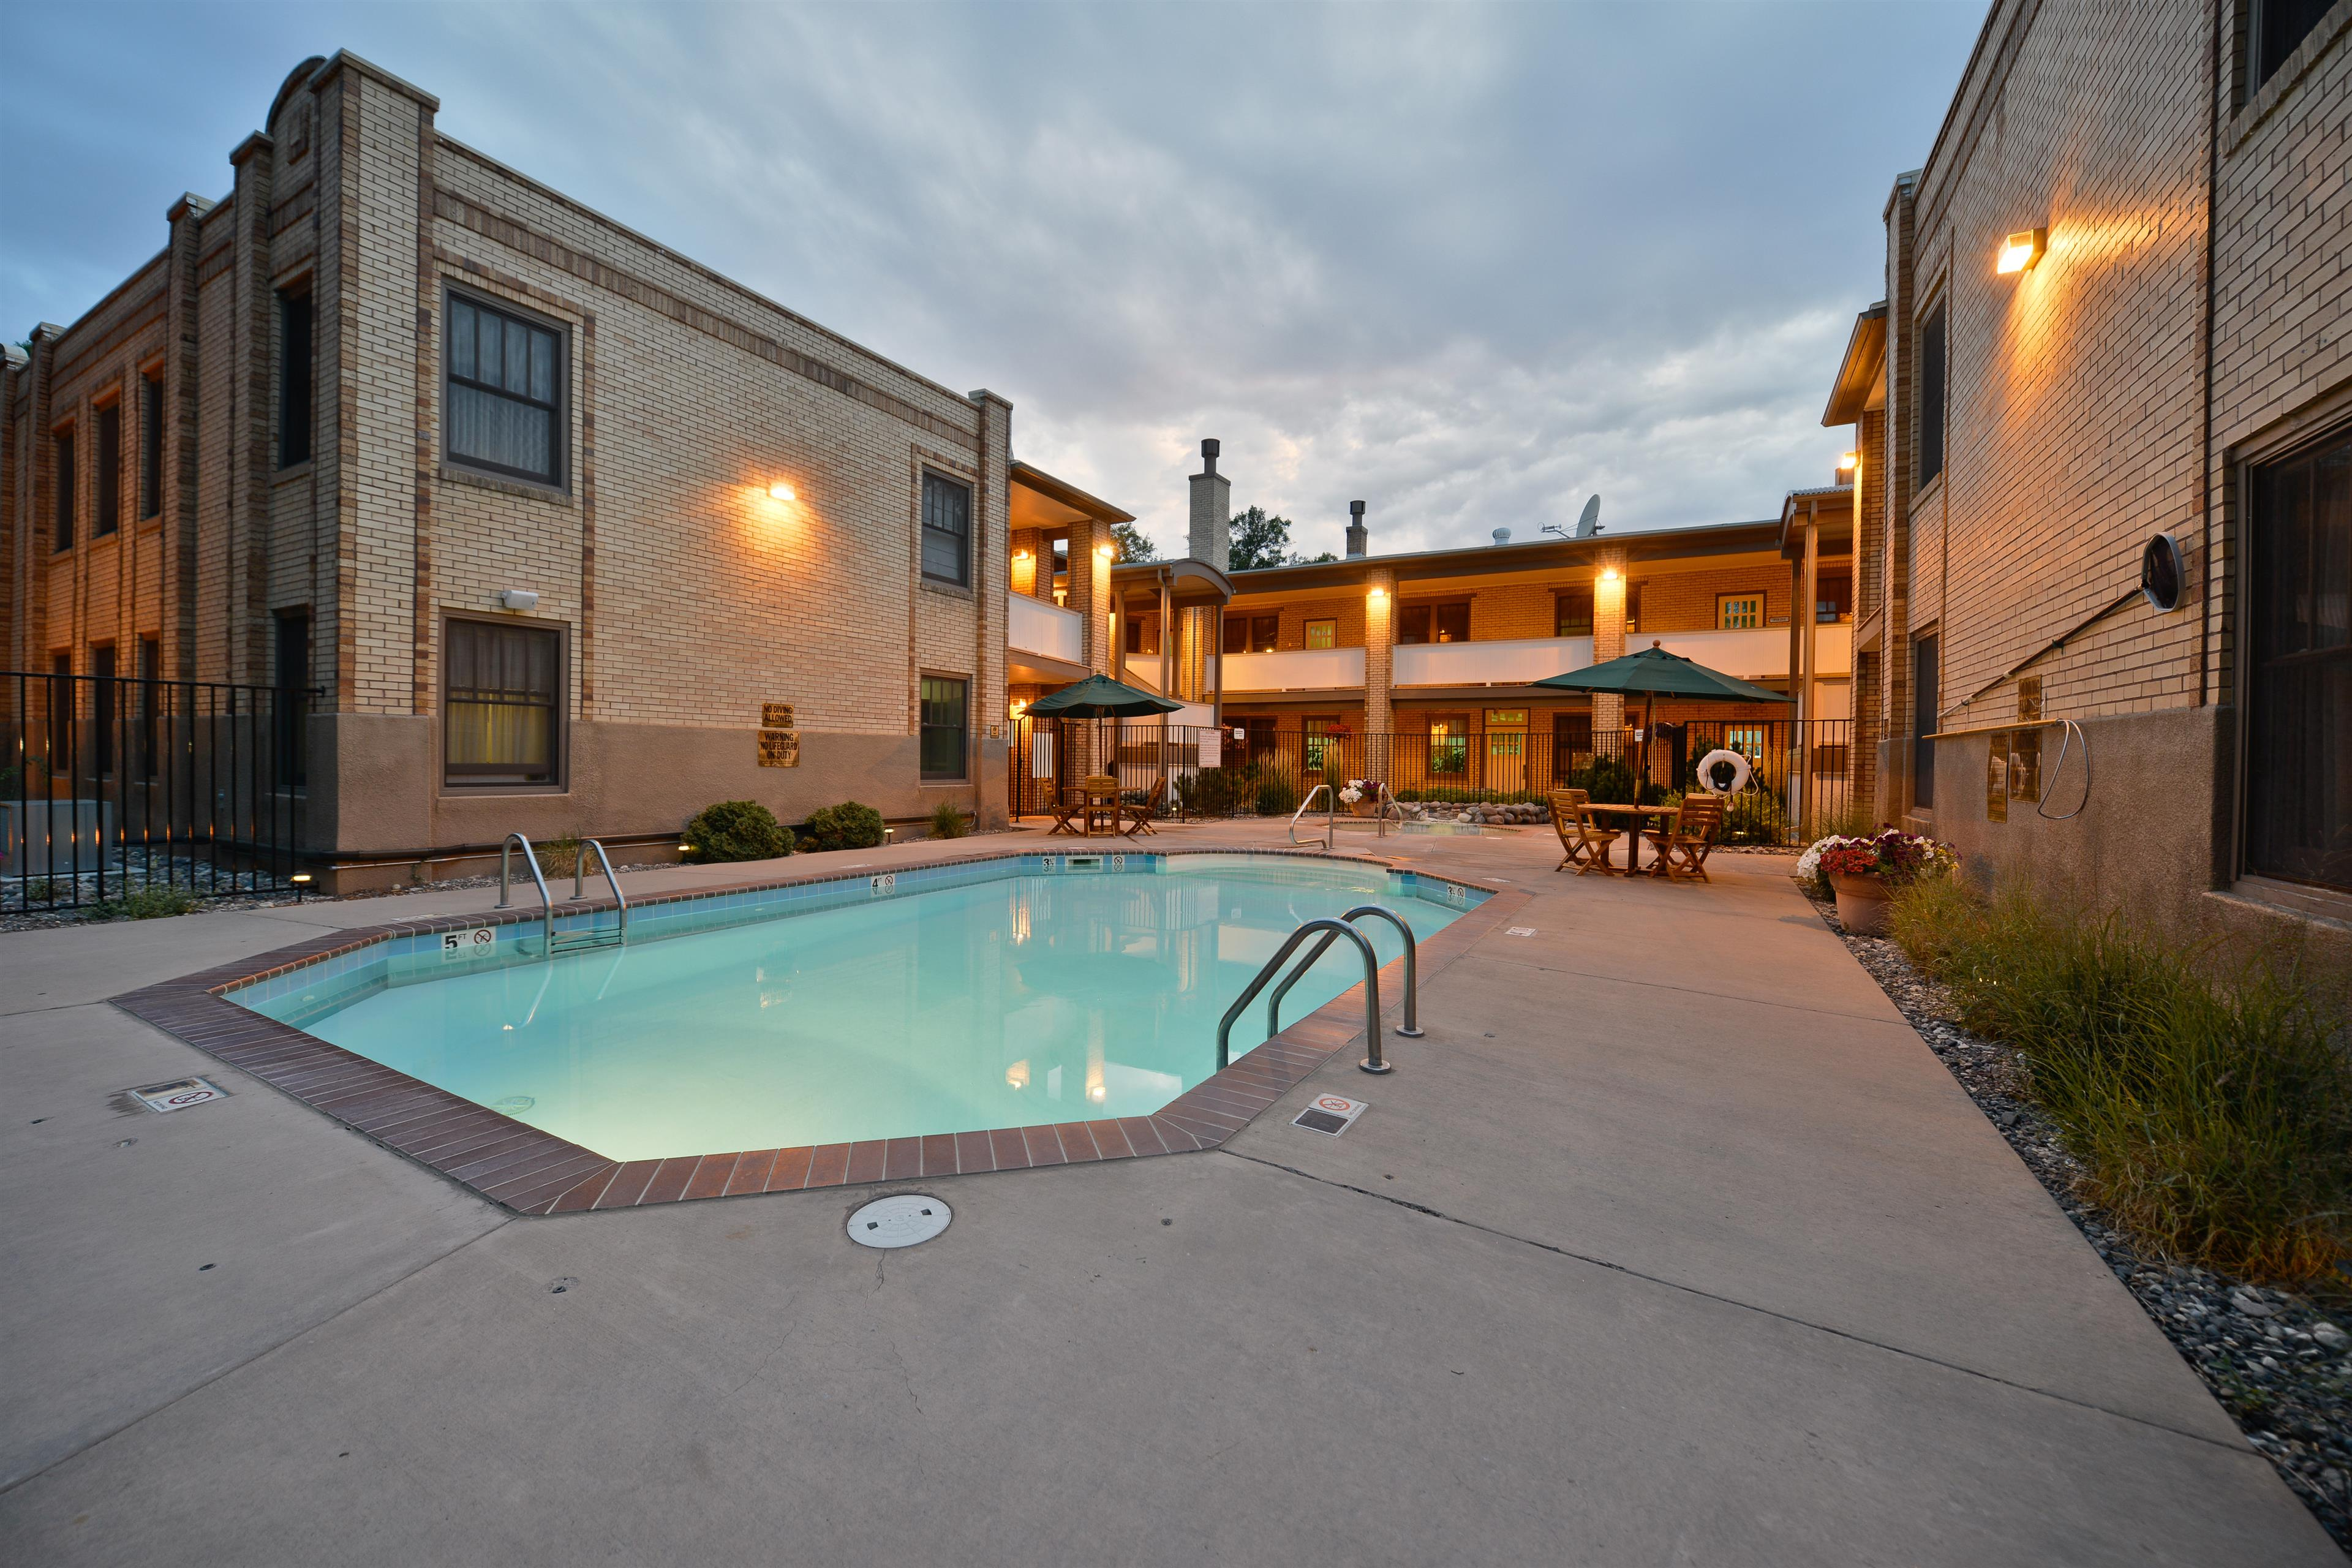 Best Western Plus Plaza Hotel image 17